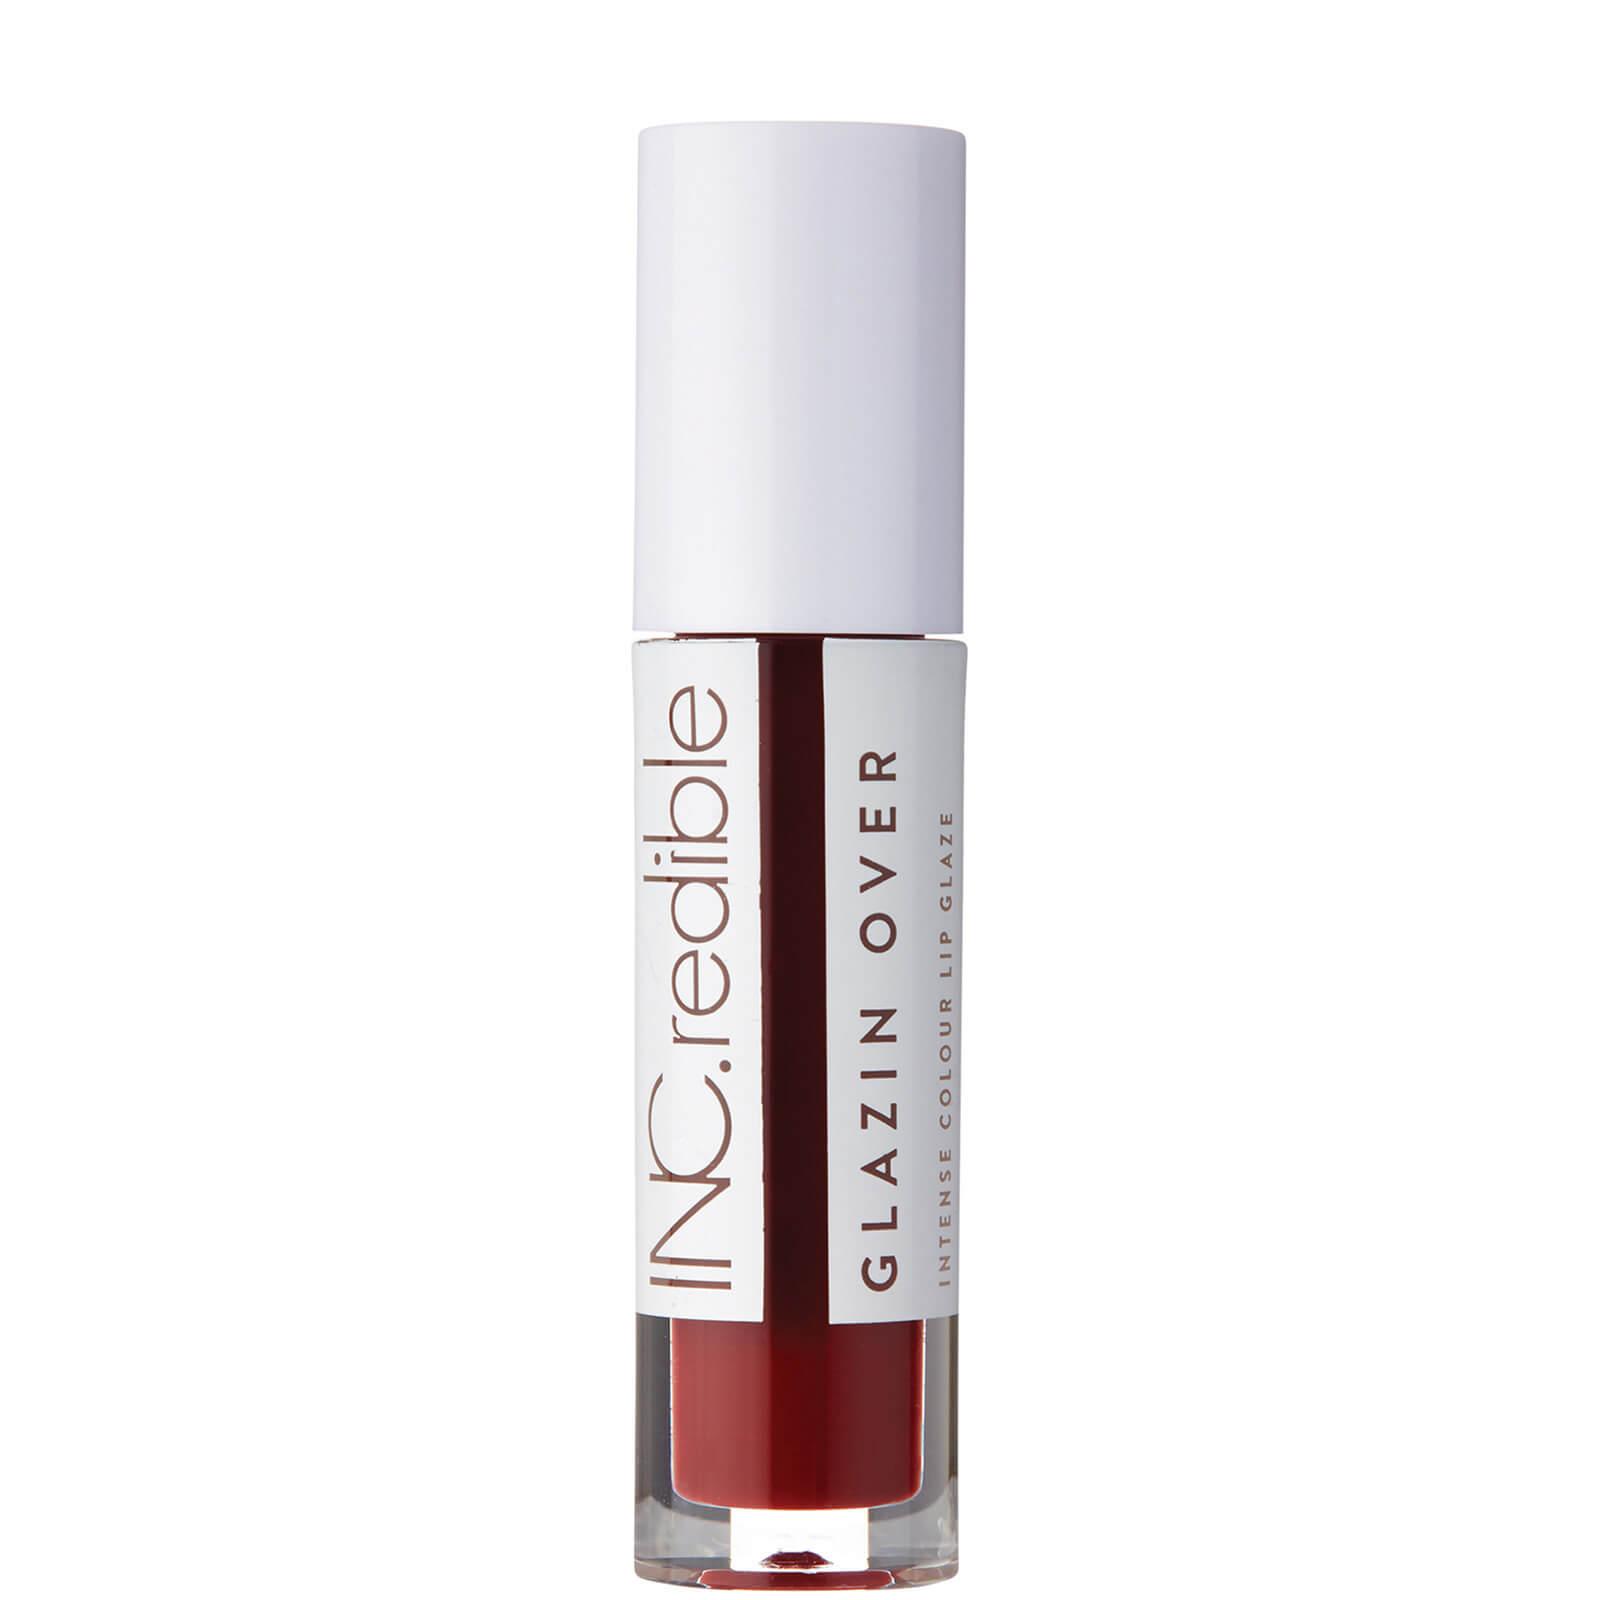 INC.redible Glazin Over gloss labbra (varie tonalità) - Find Your Light, Not Mr. Right